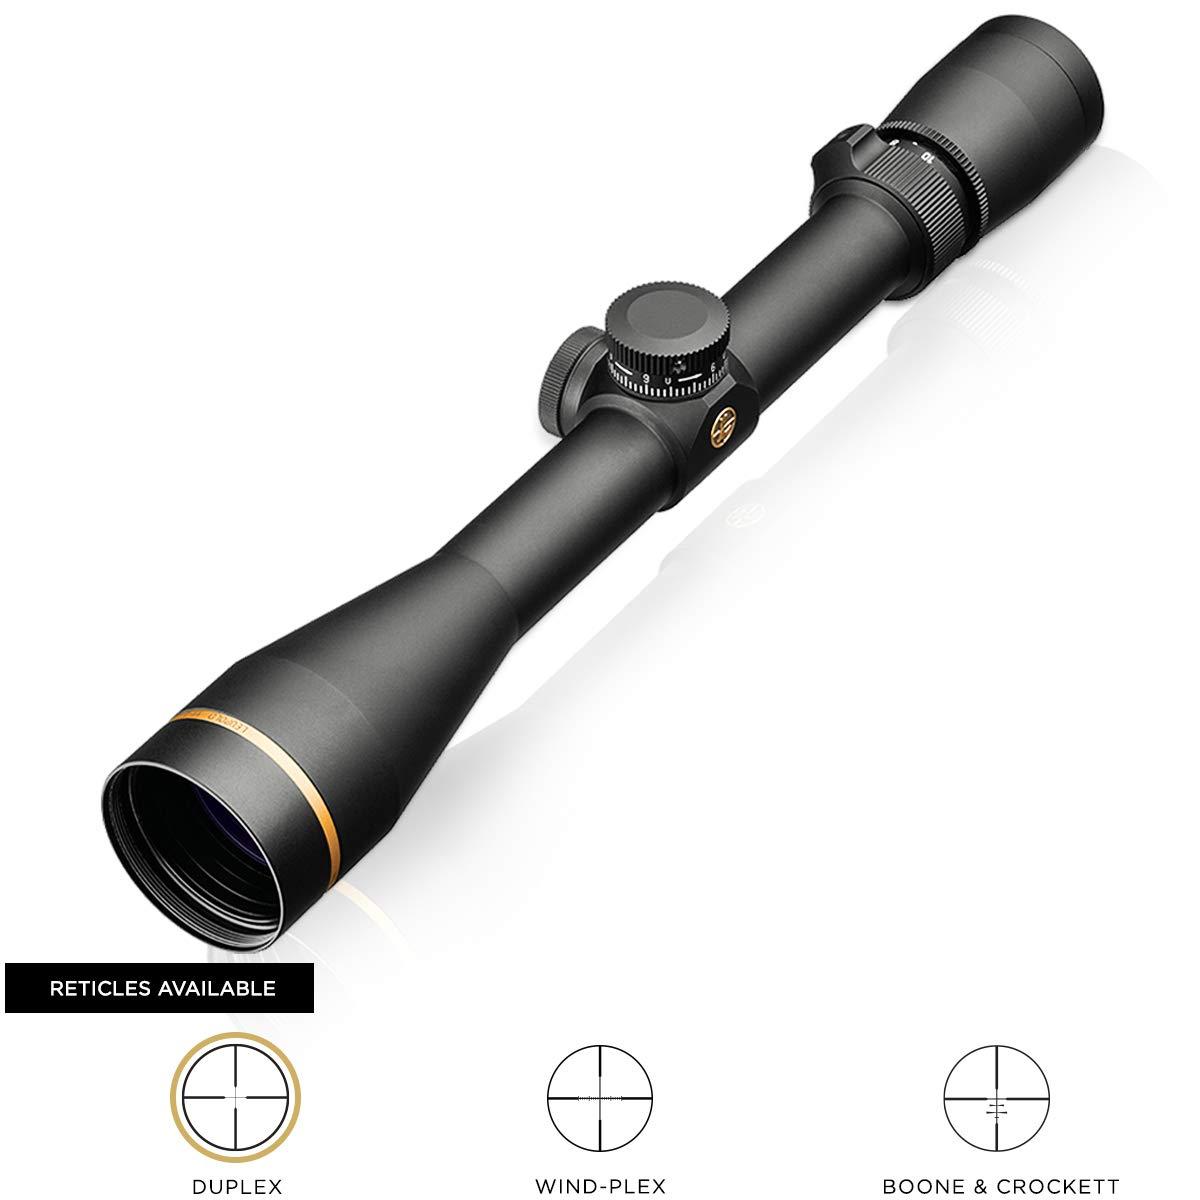 Leupold VX-3i 3.5x10x40mm Rifle Scope 170683 Matte Duplex CDS